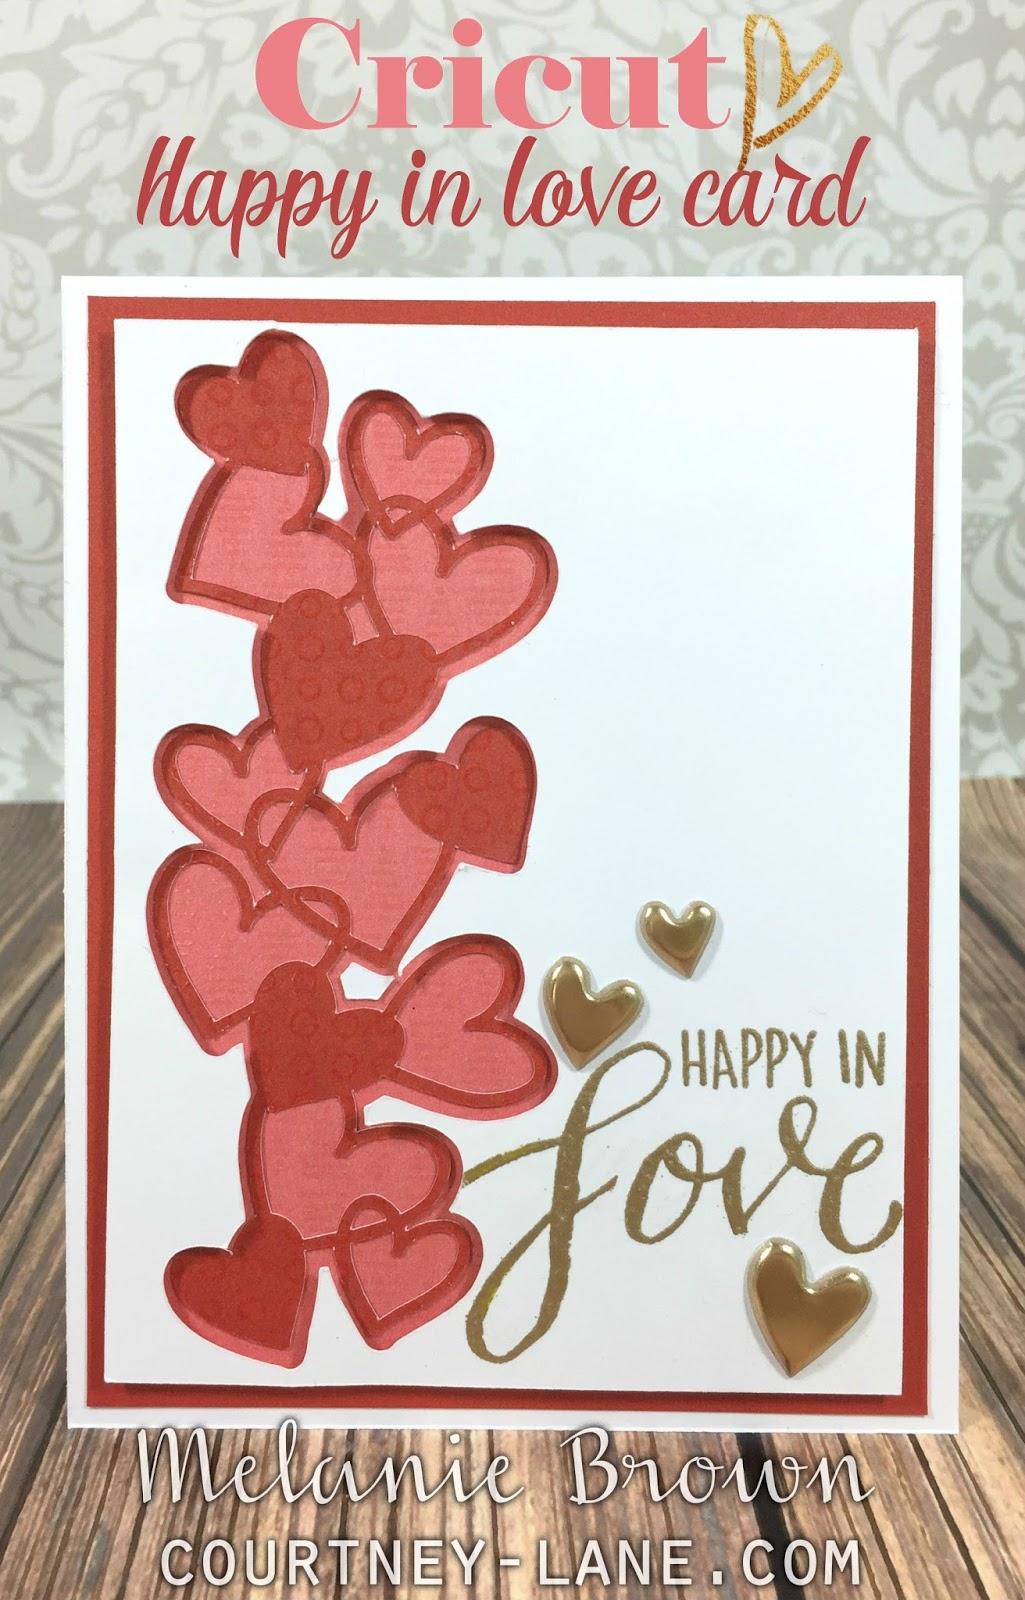 courtney lane designs cricut happy in love card